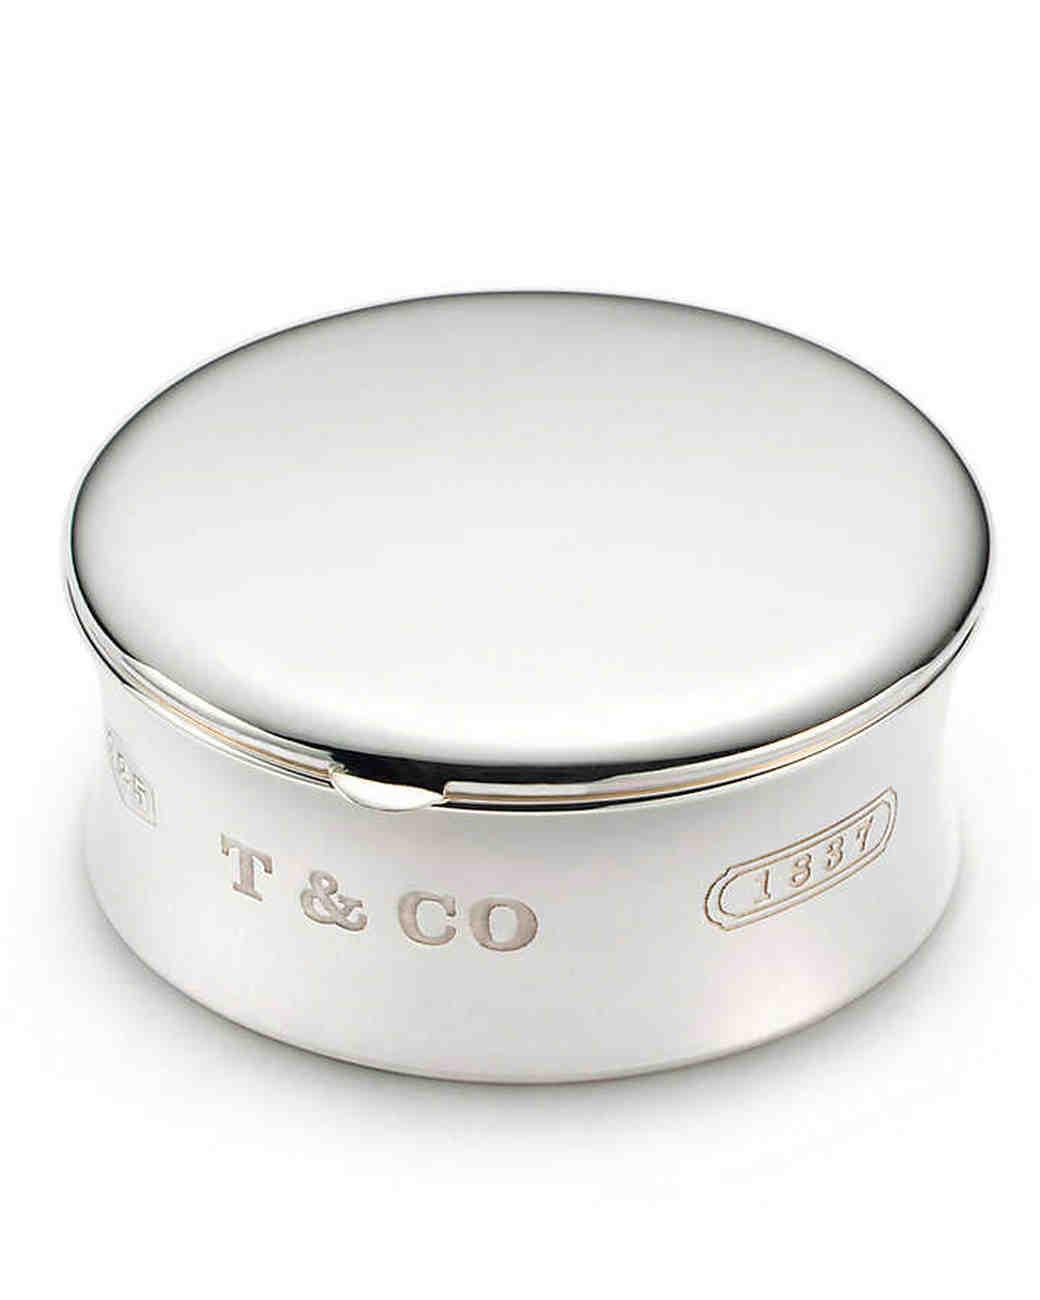 ring-boxes-tiffany-silver-pillbox-0115.jpg